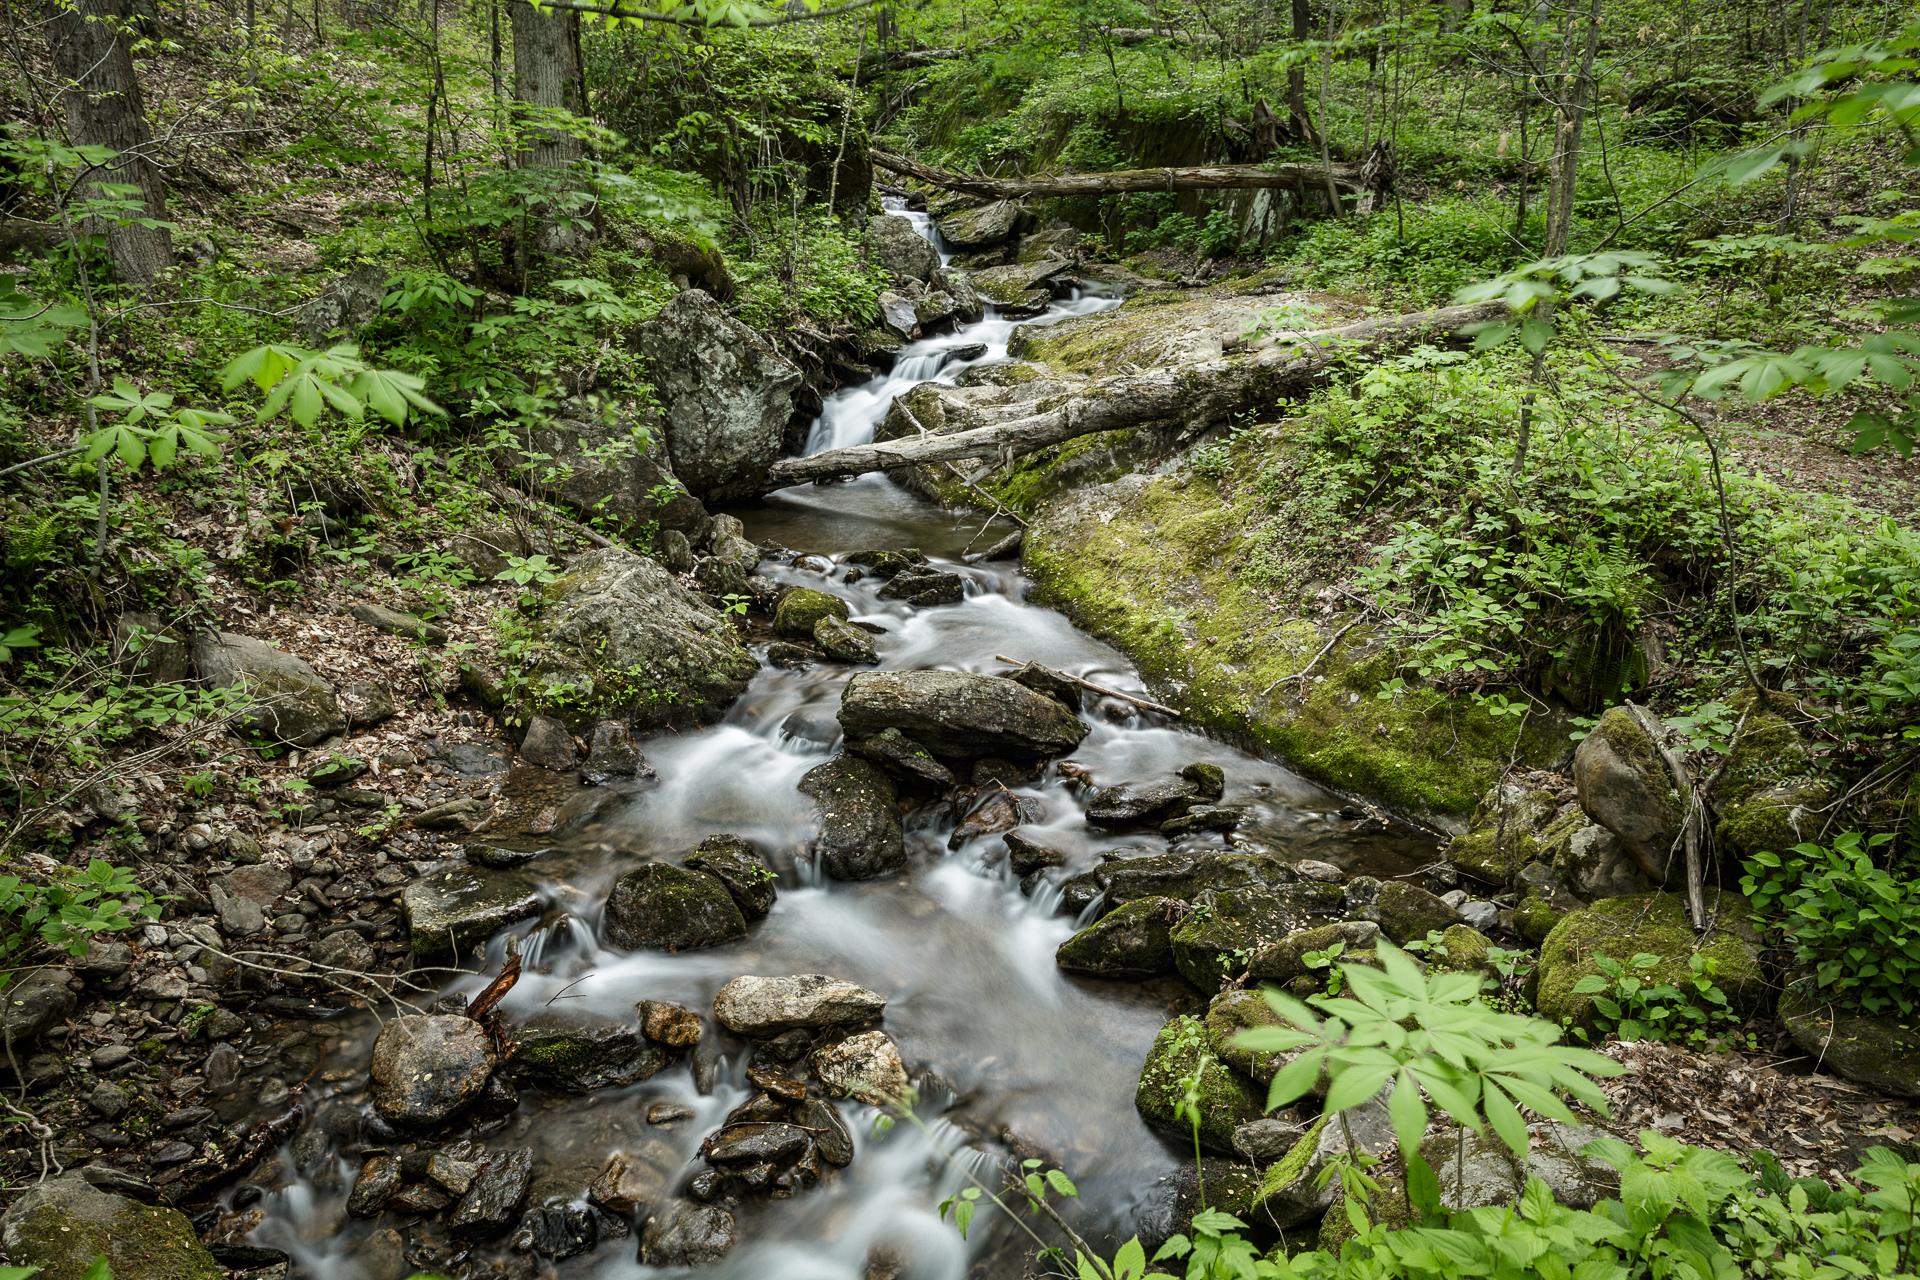 walker-falls-in-the-pisgah-national-forest-Kathleen-Kathy-Roberts-Asheville-NC-Photographer-2.jpg